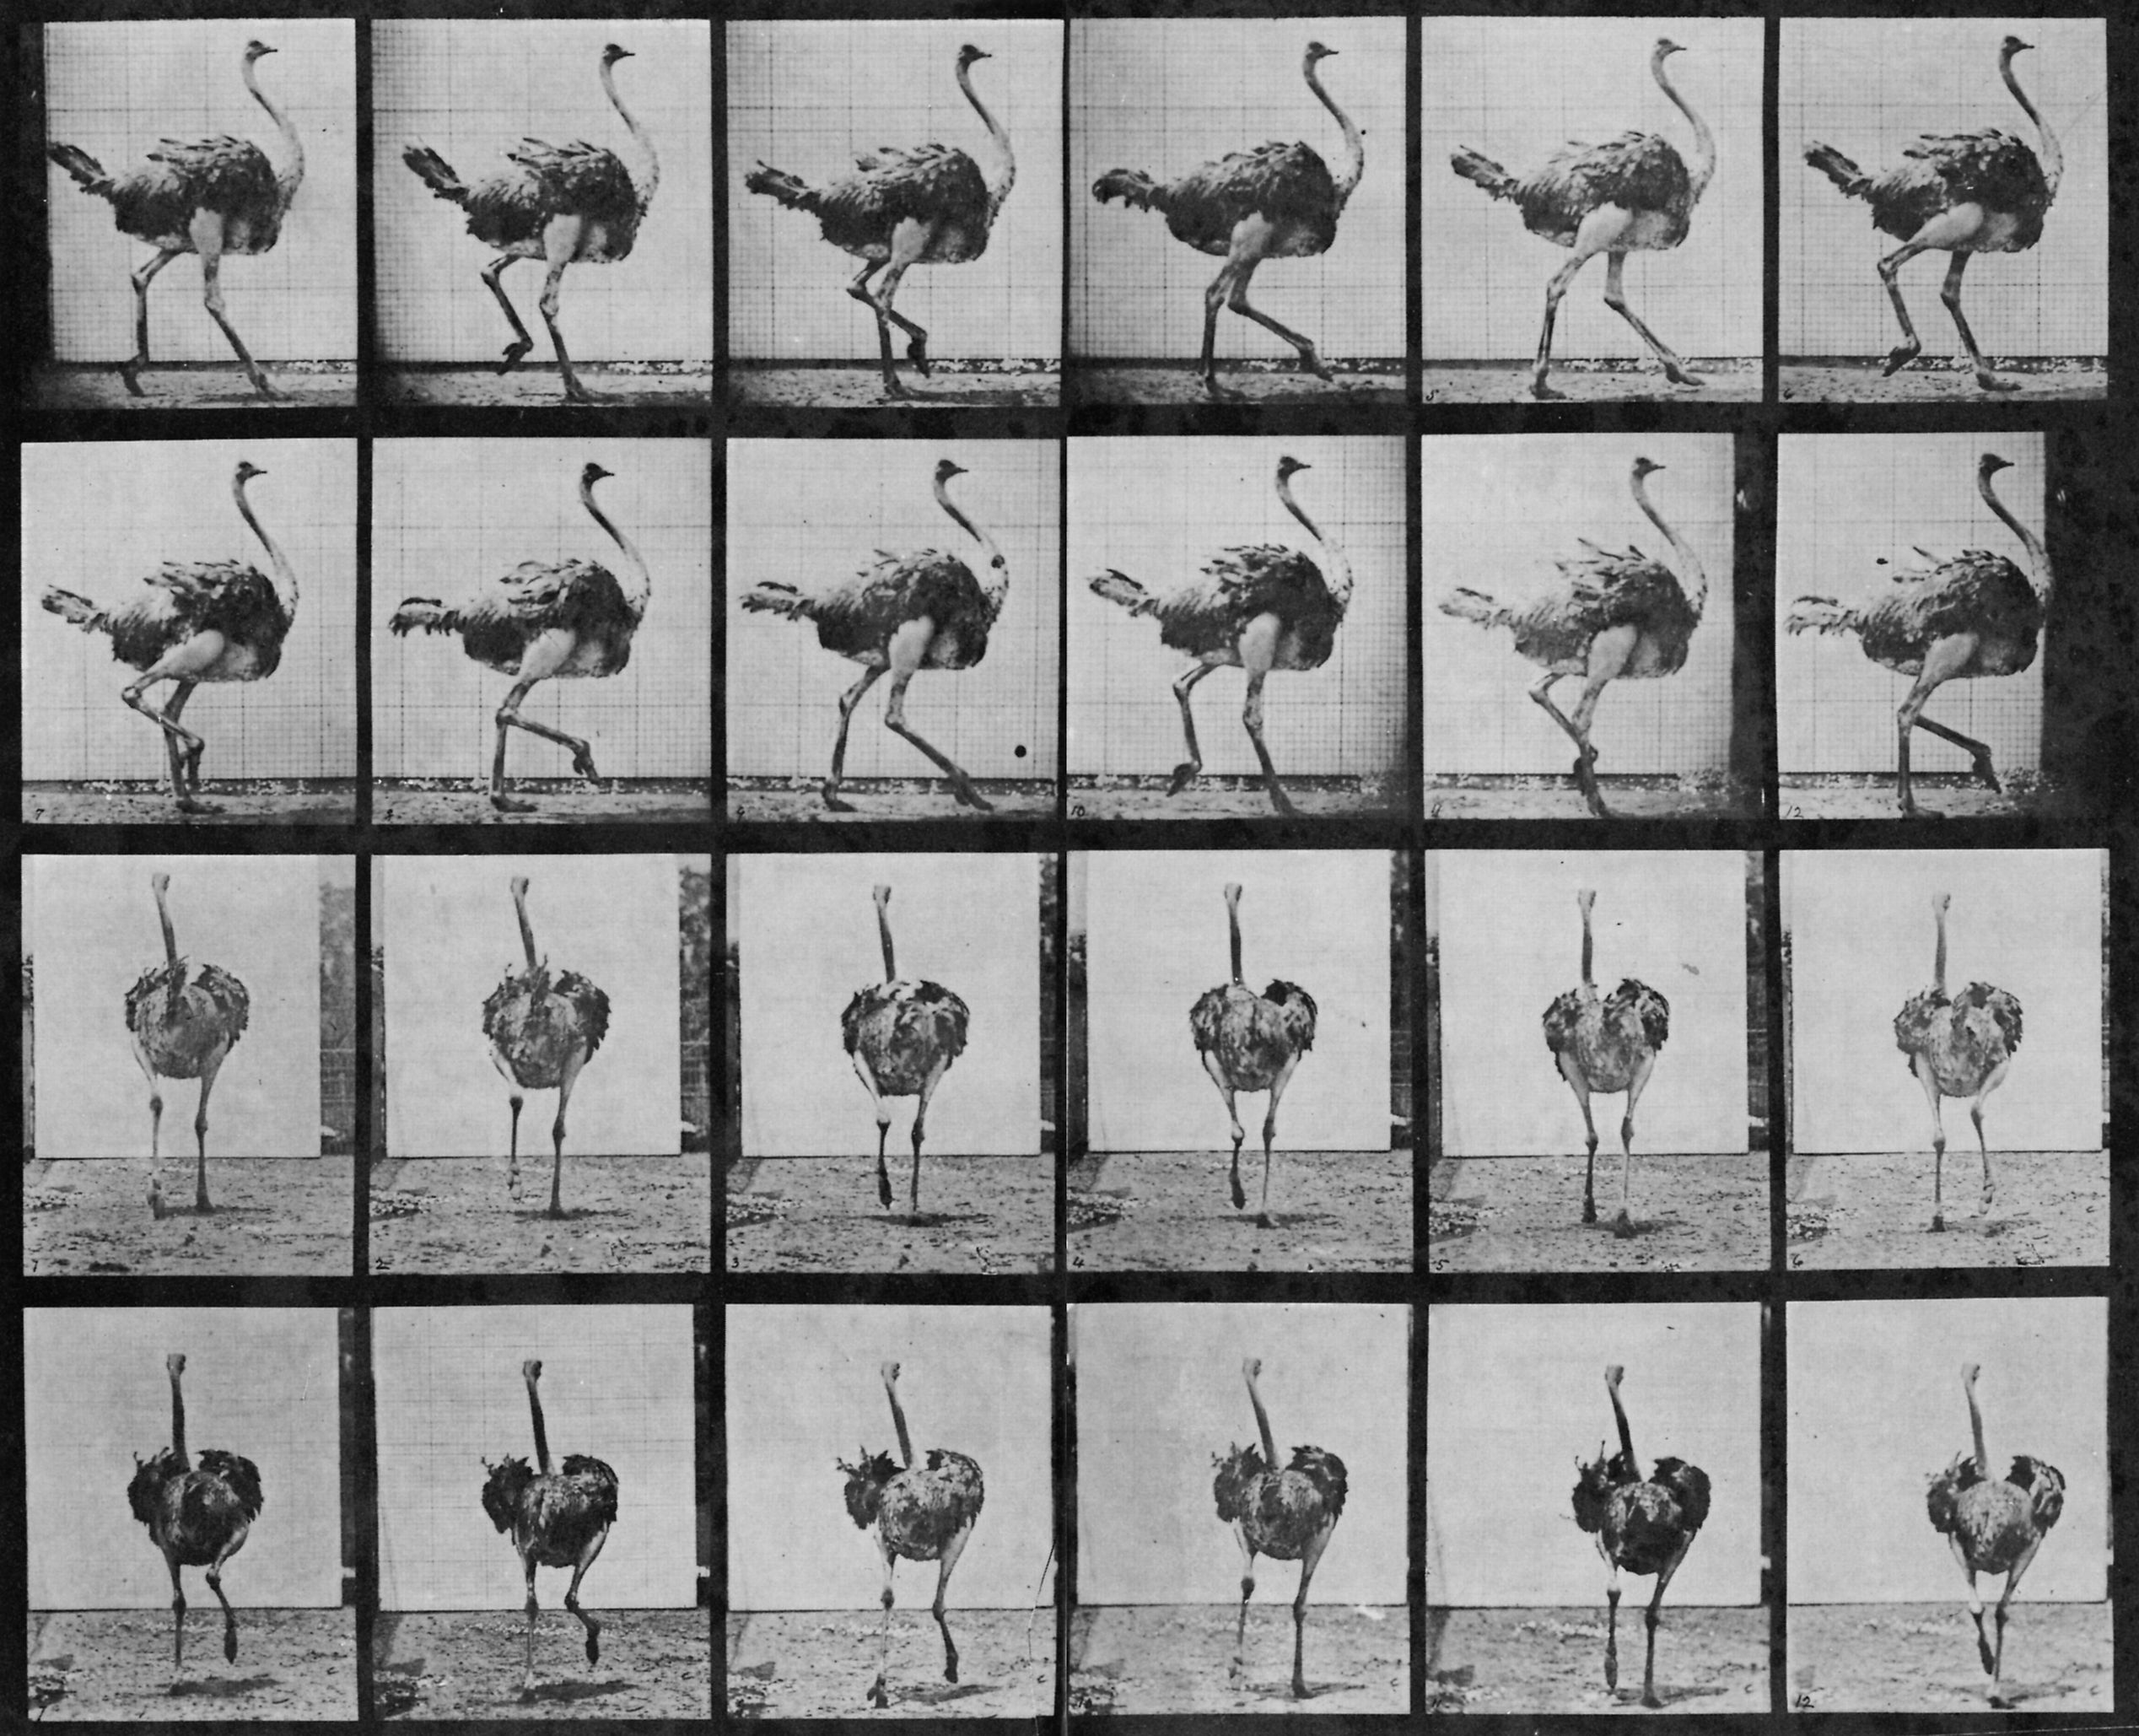 Eadweard Muybridge Animal And Human Locomotion on Life Cycle Flip Book